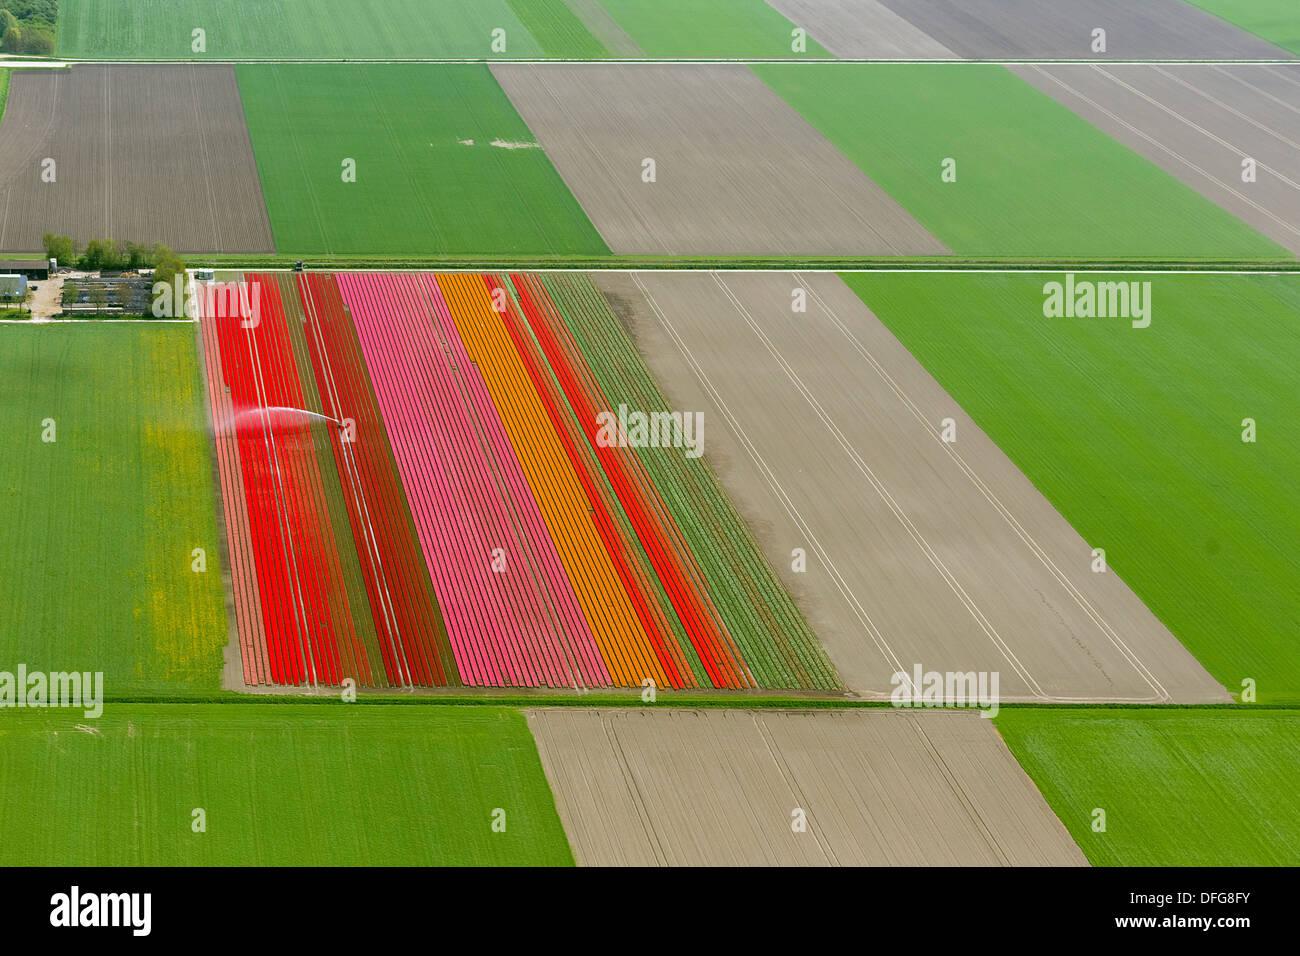 Field irrigation, tulip fields, aerial view, Zeewolde, Flevoland, The Netherlands - Stock Image